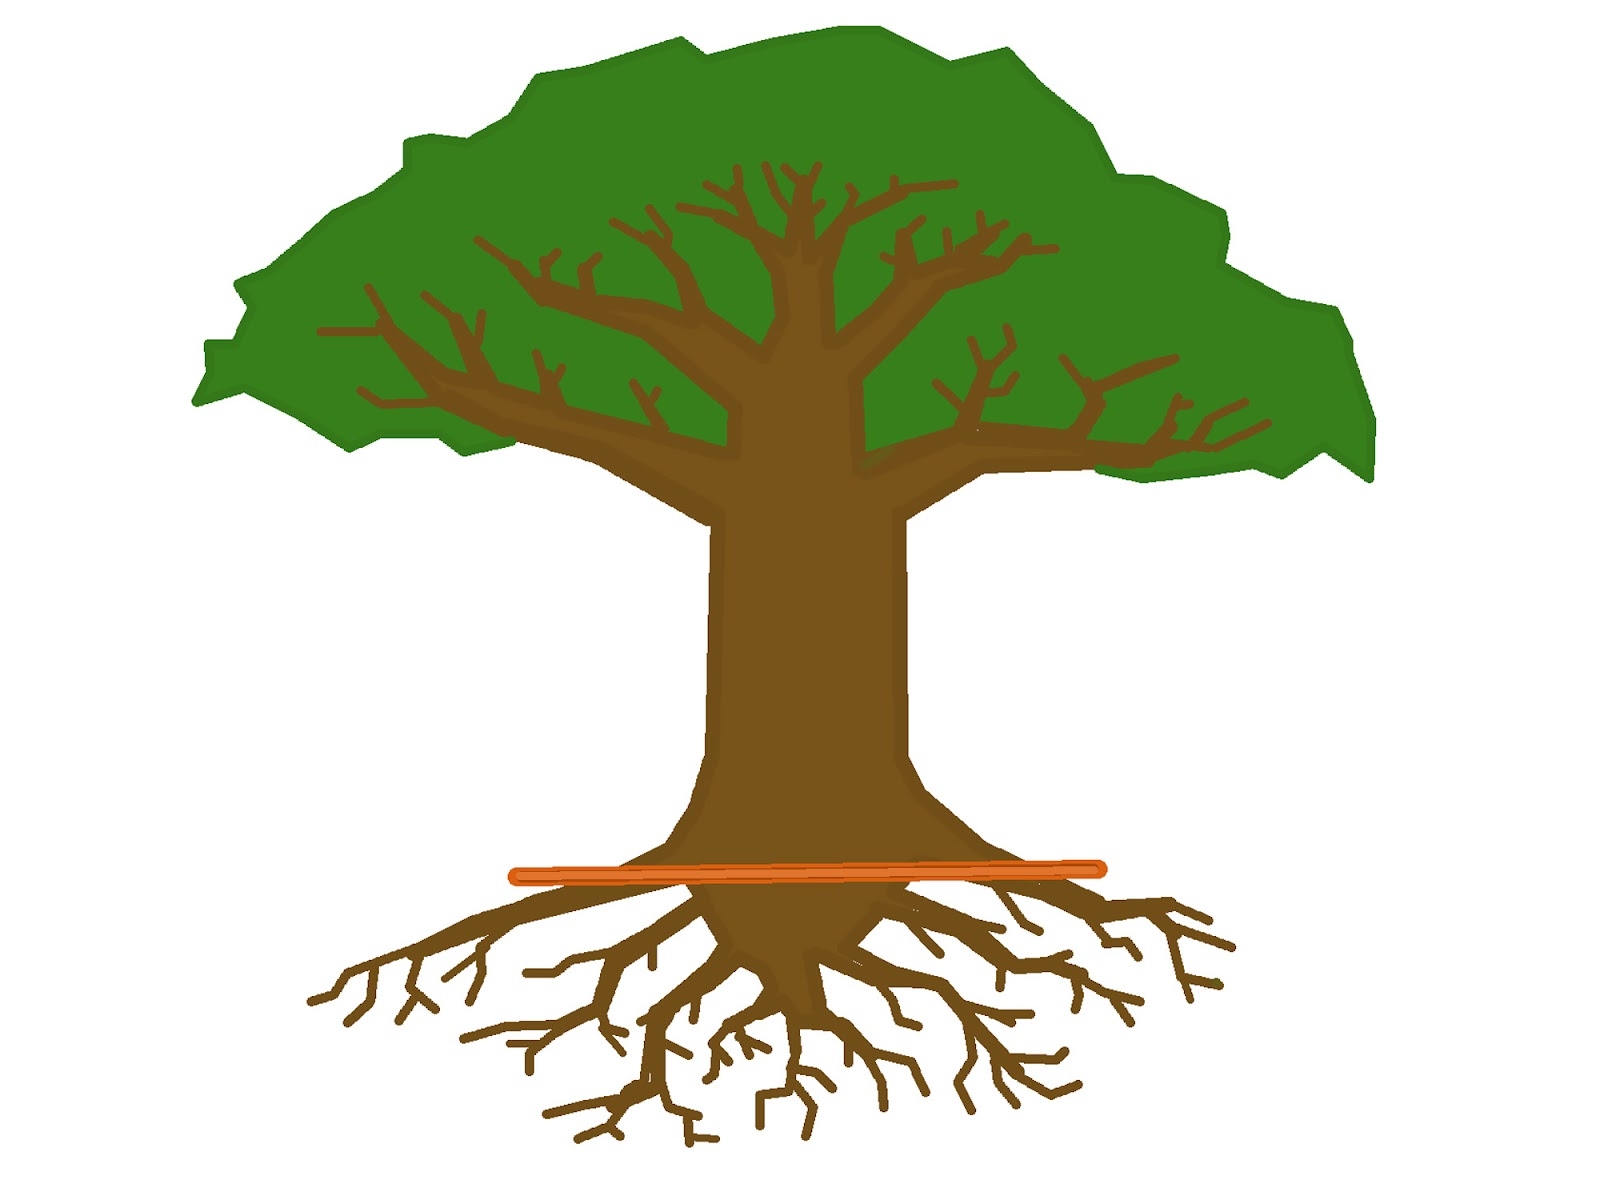 1600x1200 Clipart Tree Roots Cliparts Free Download Clip Art